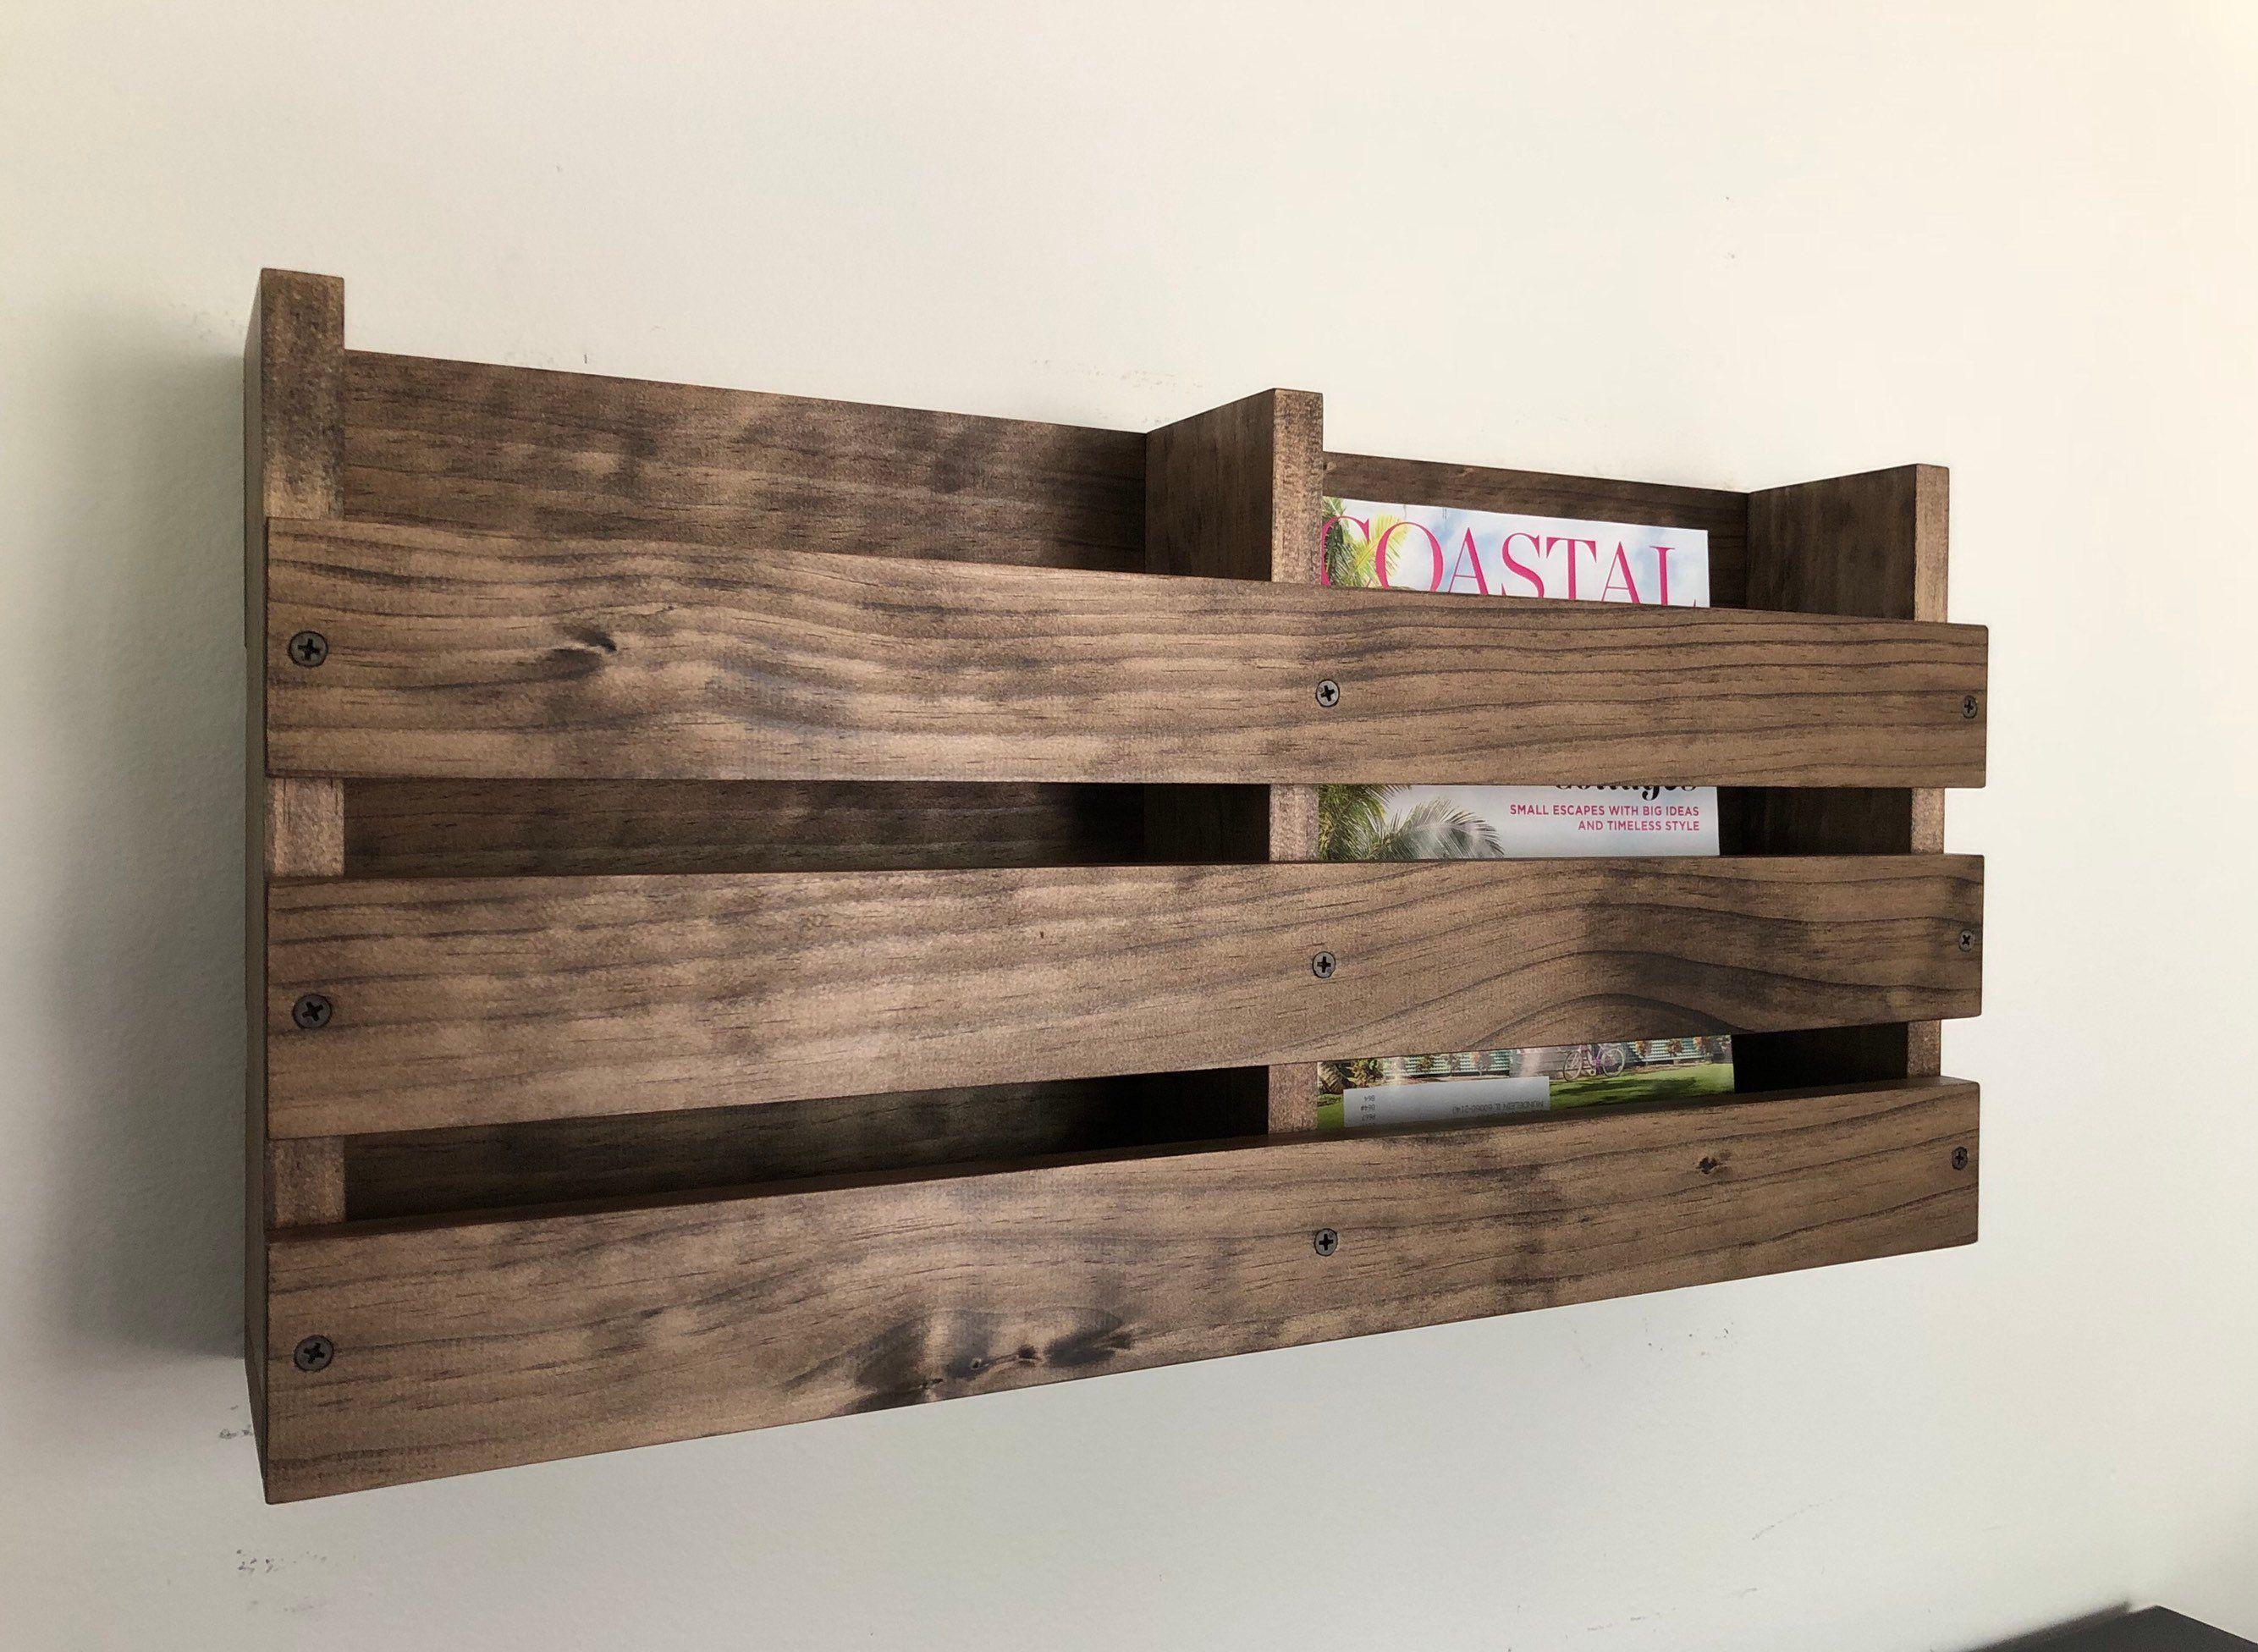 Double Magazine Wood Rack Wall Mounted Menu Holder Rustic Wood